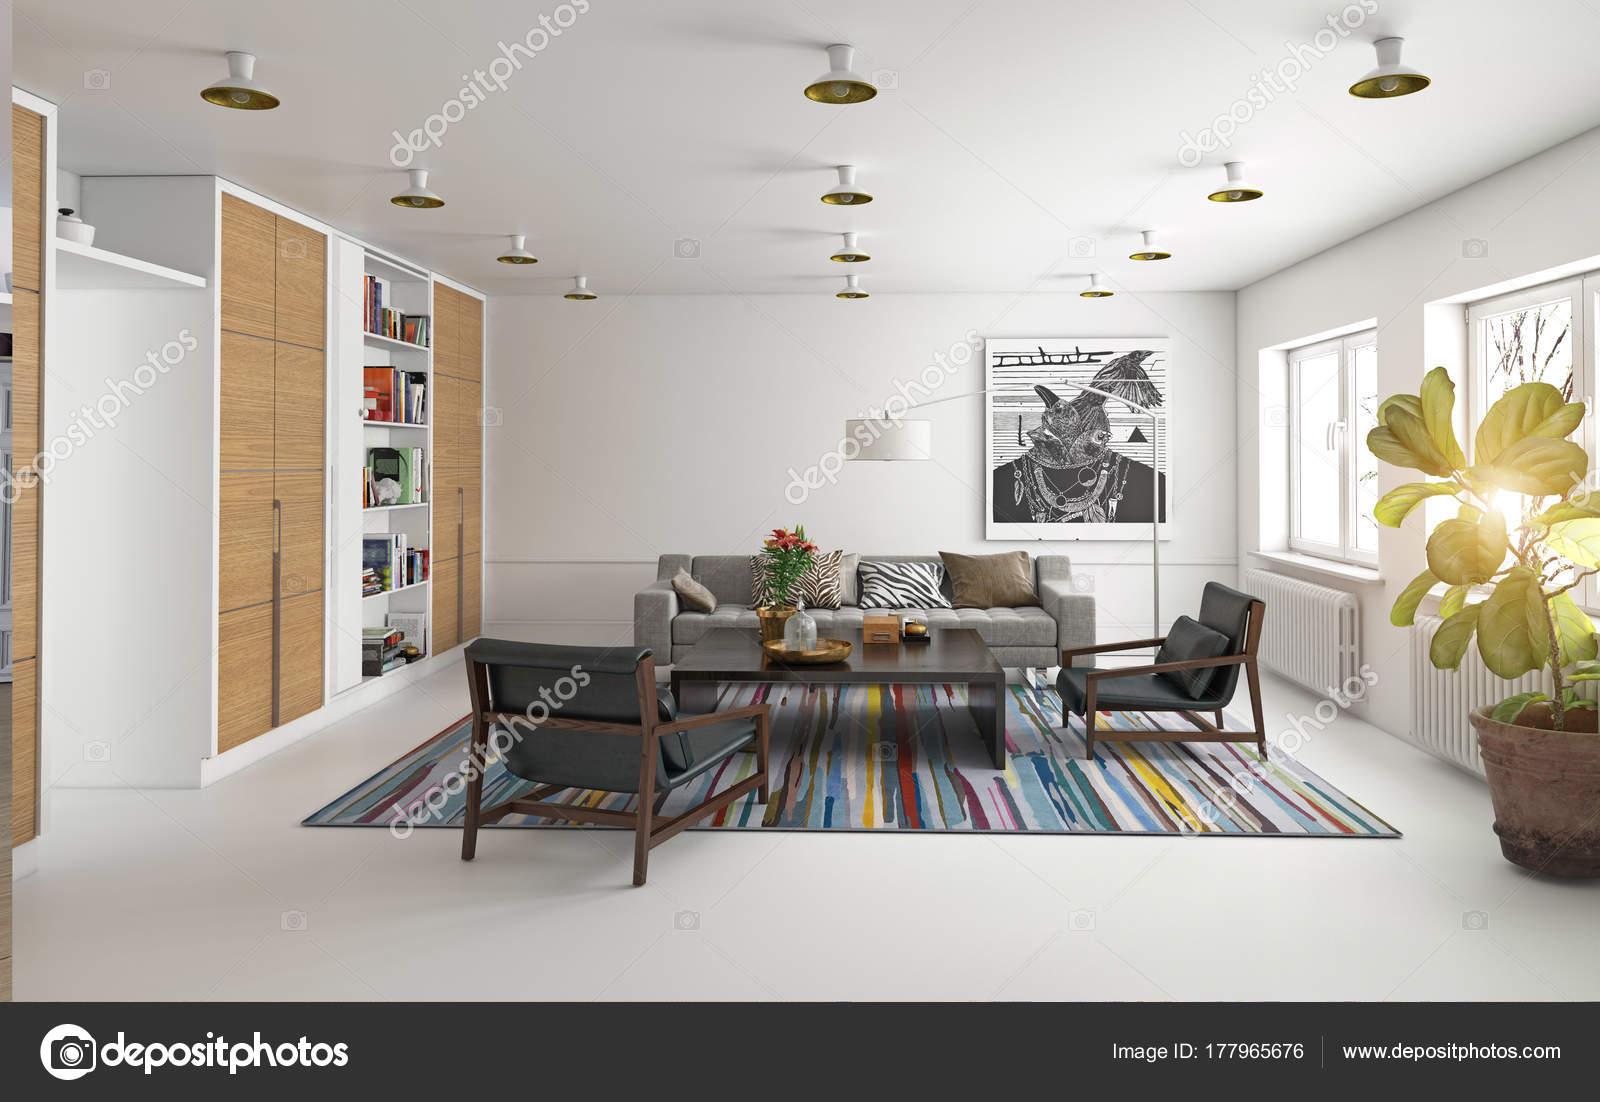 Moderne Woonkamer Ontwerp Rendering Interieurconcept — Stockfoto ...